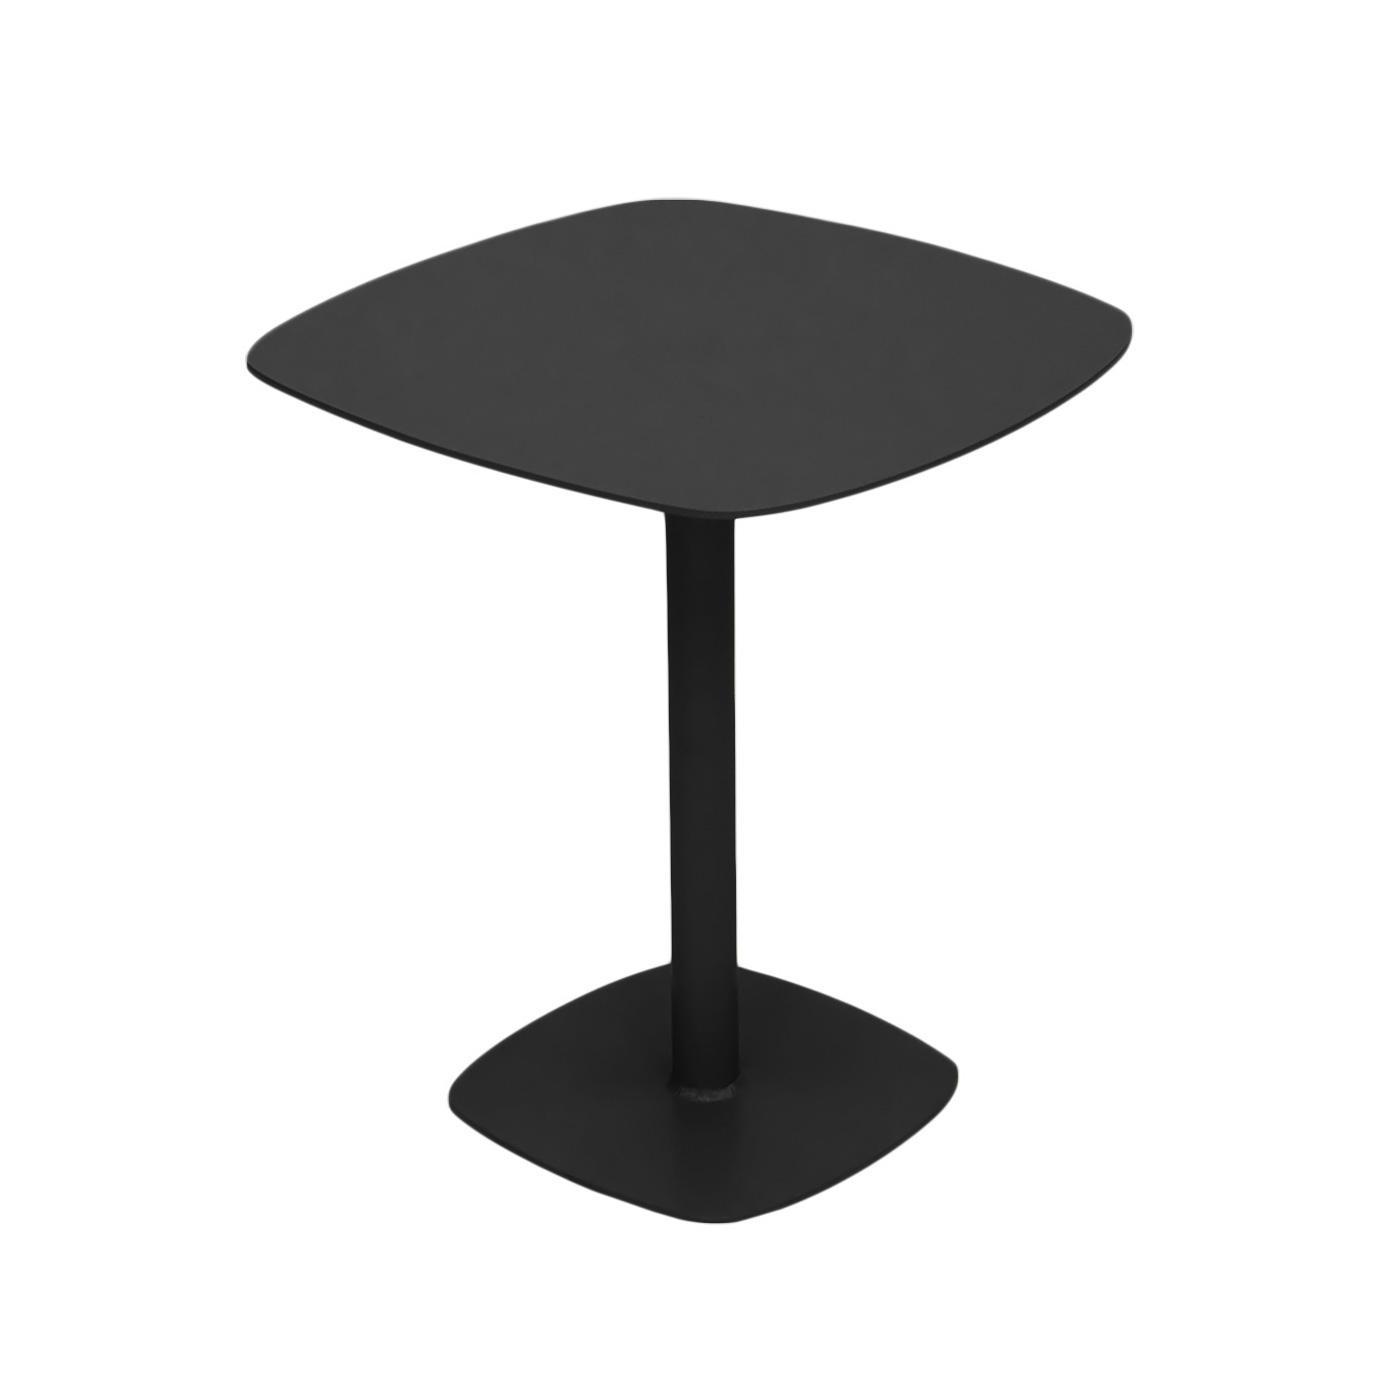 hybrid-side-table-black